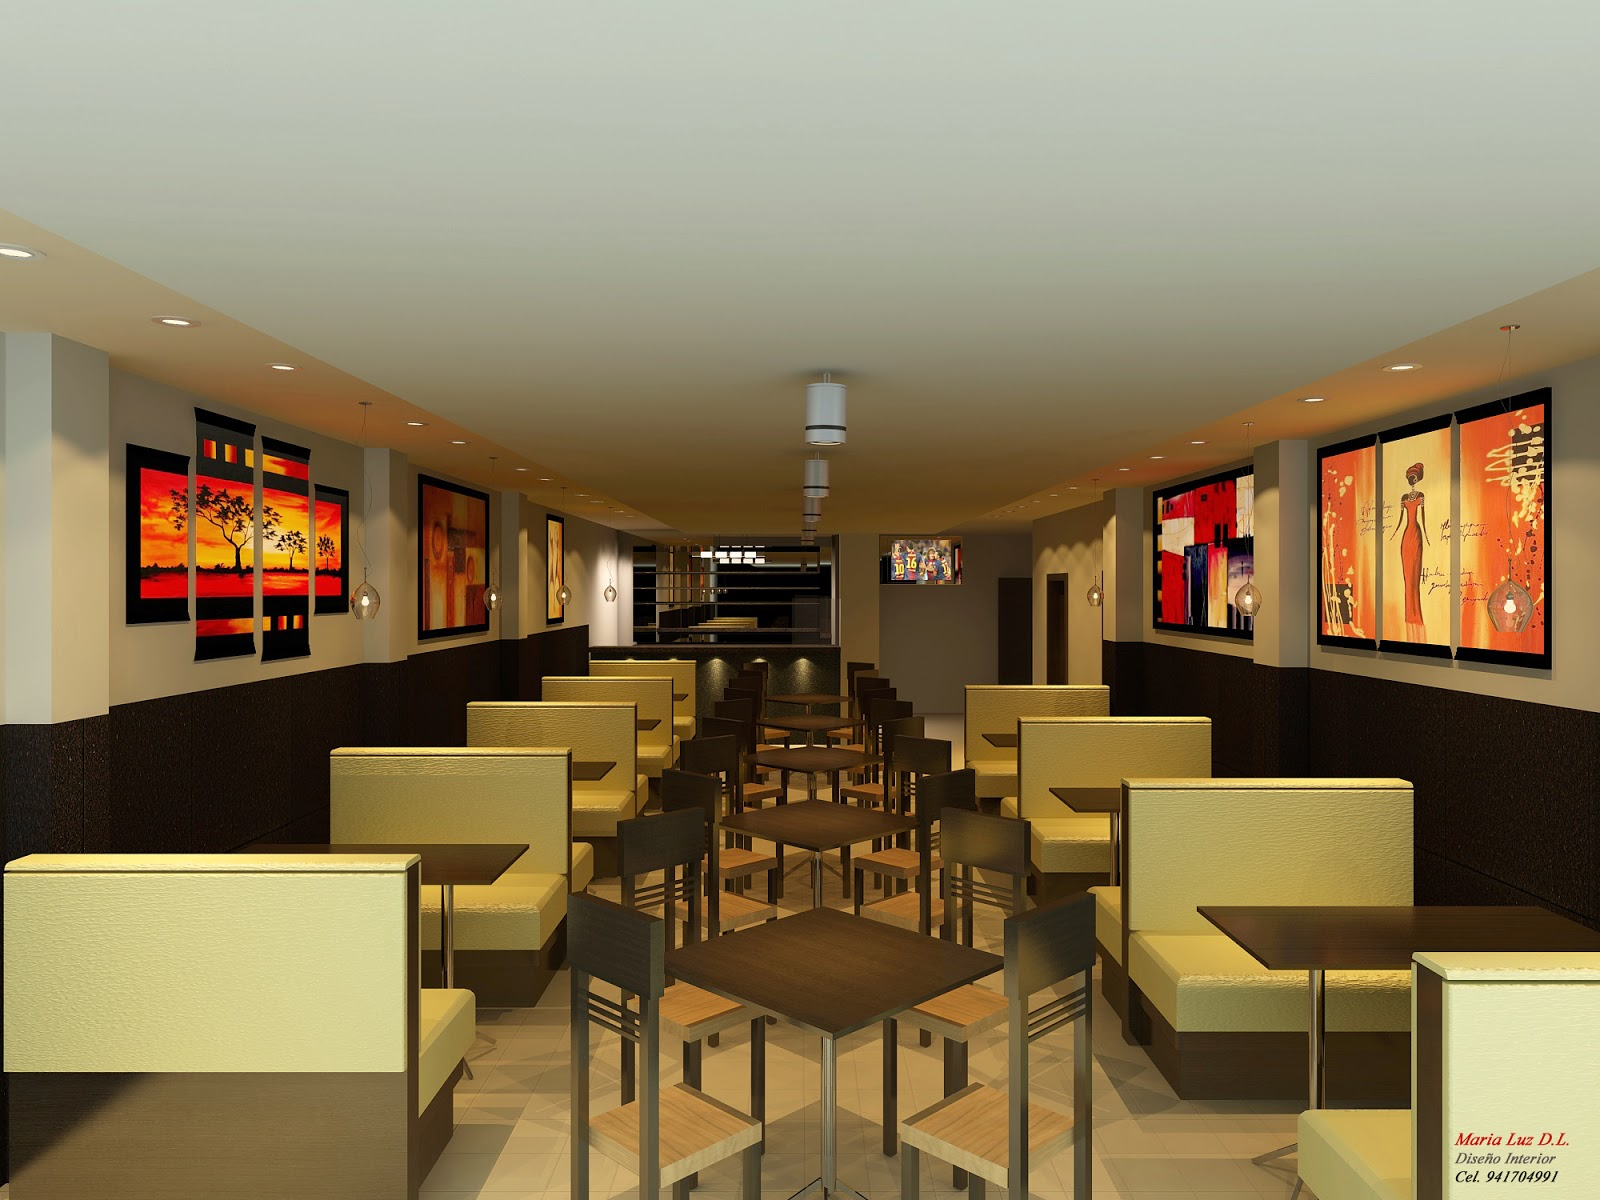 Polleria lima spazio interior for Decoracion de interiores logo